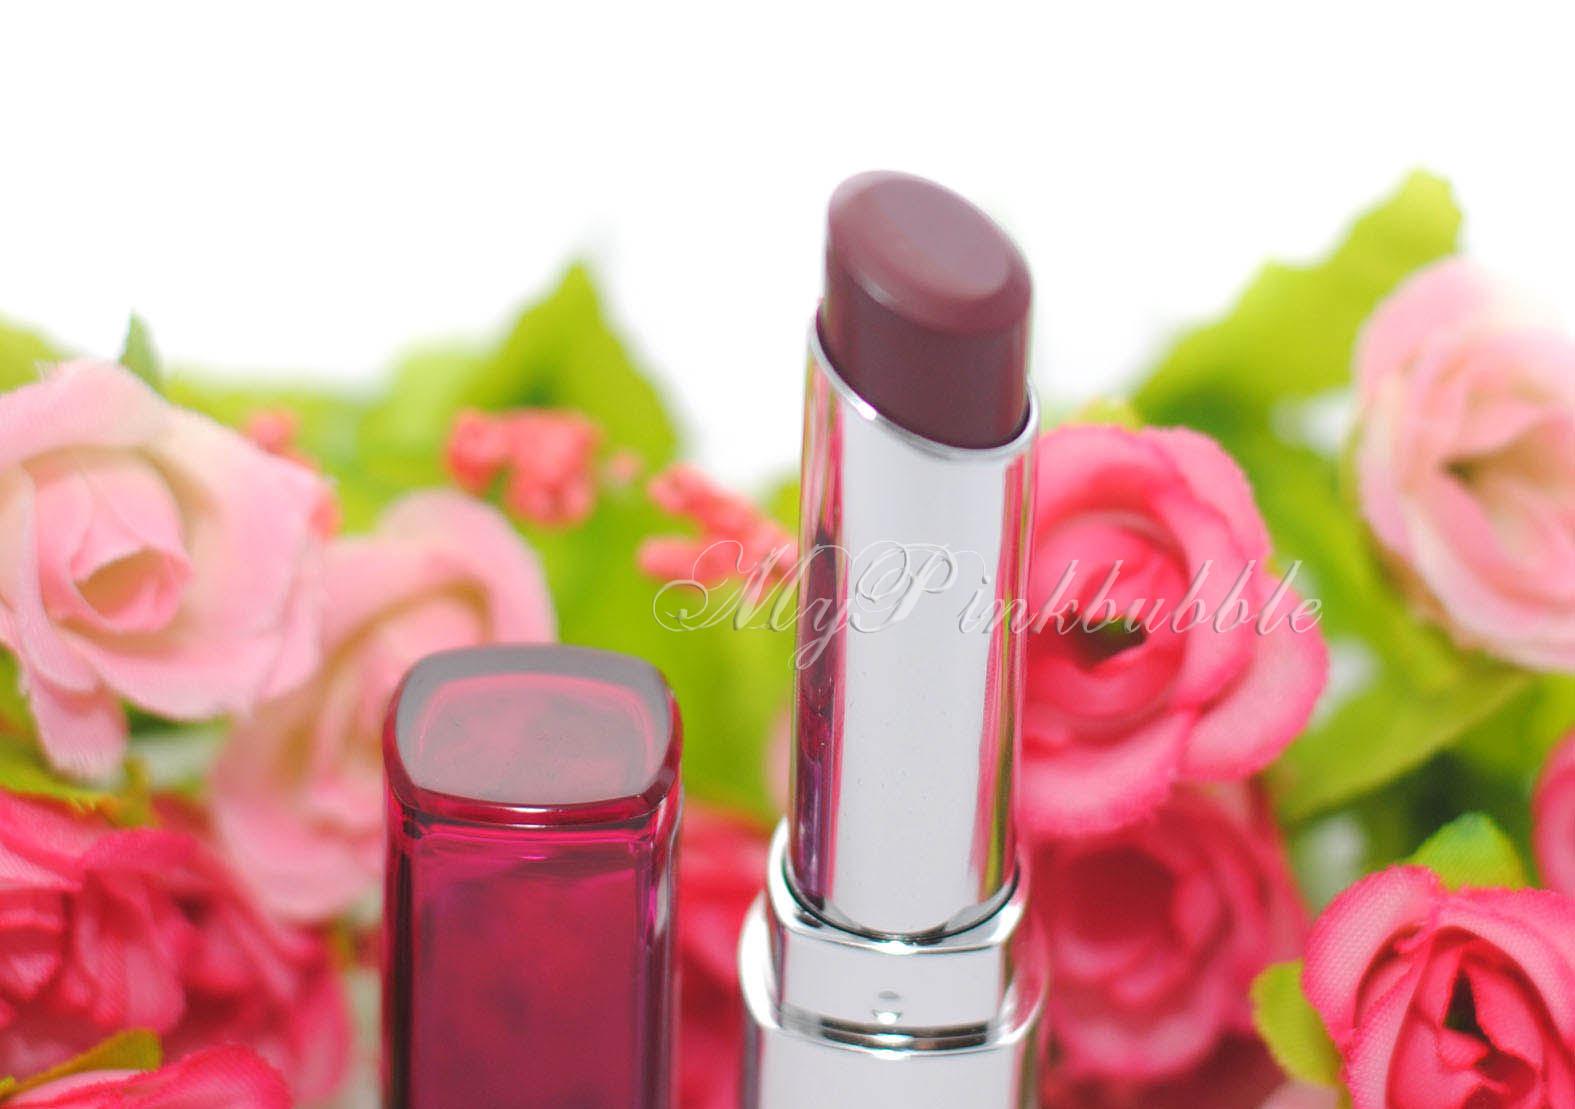 Flormar Delicious Lipstick